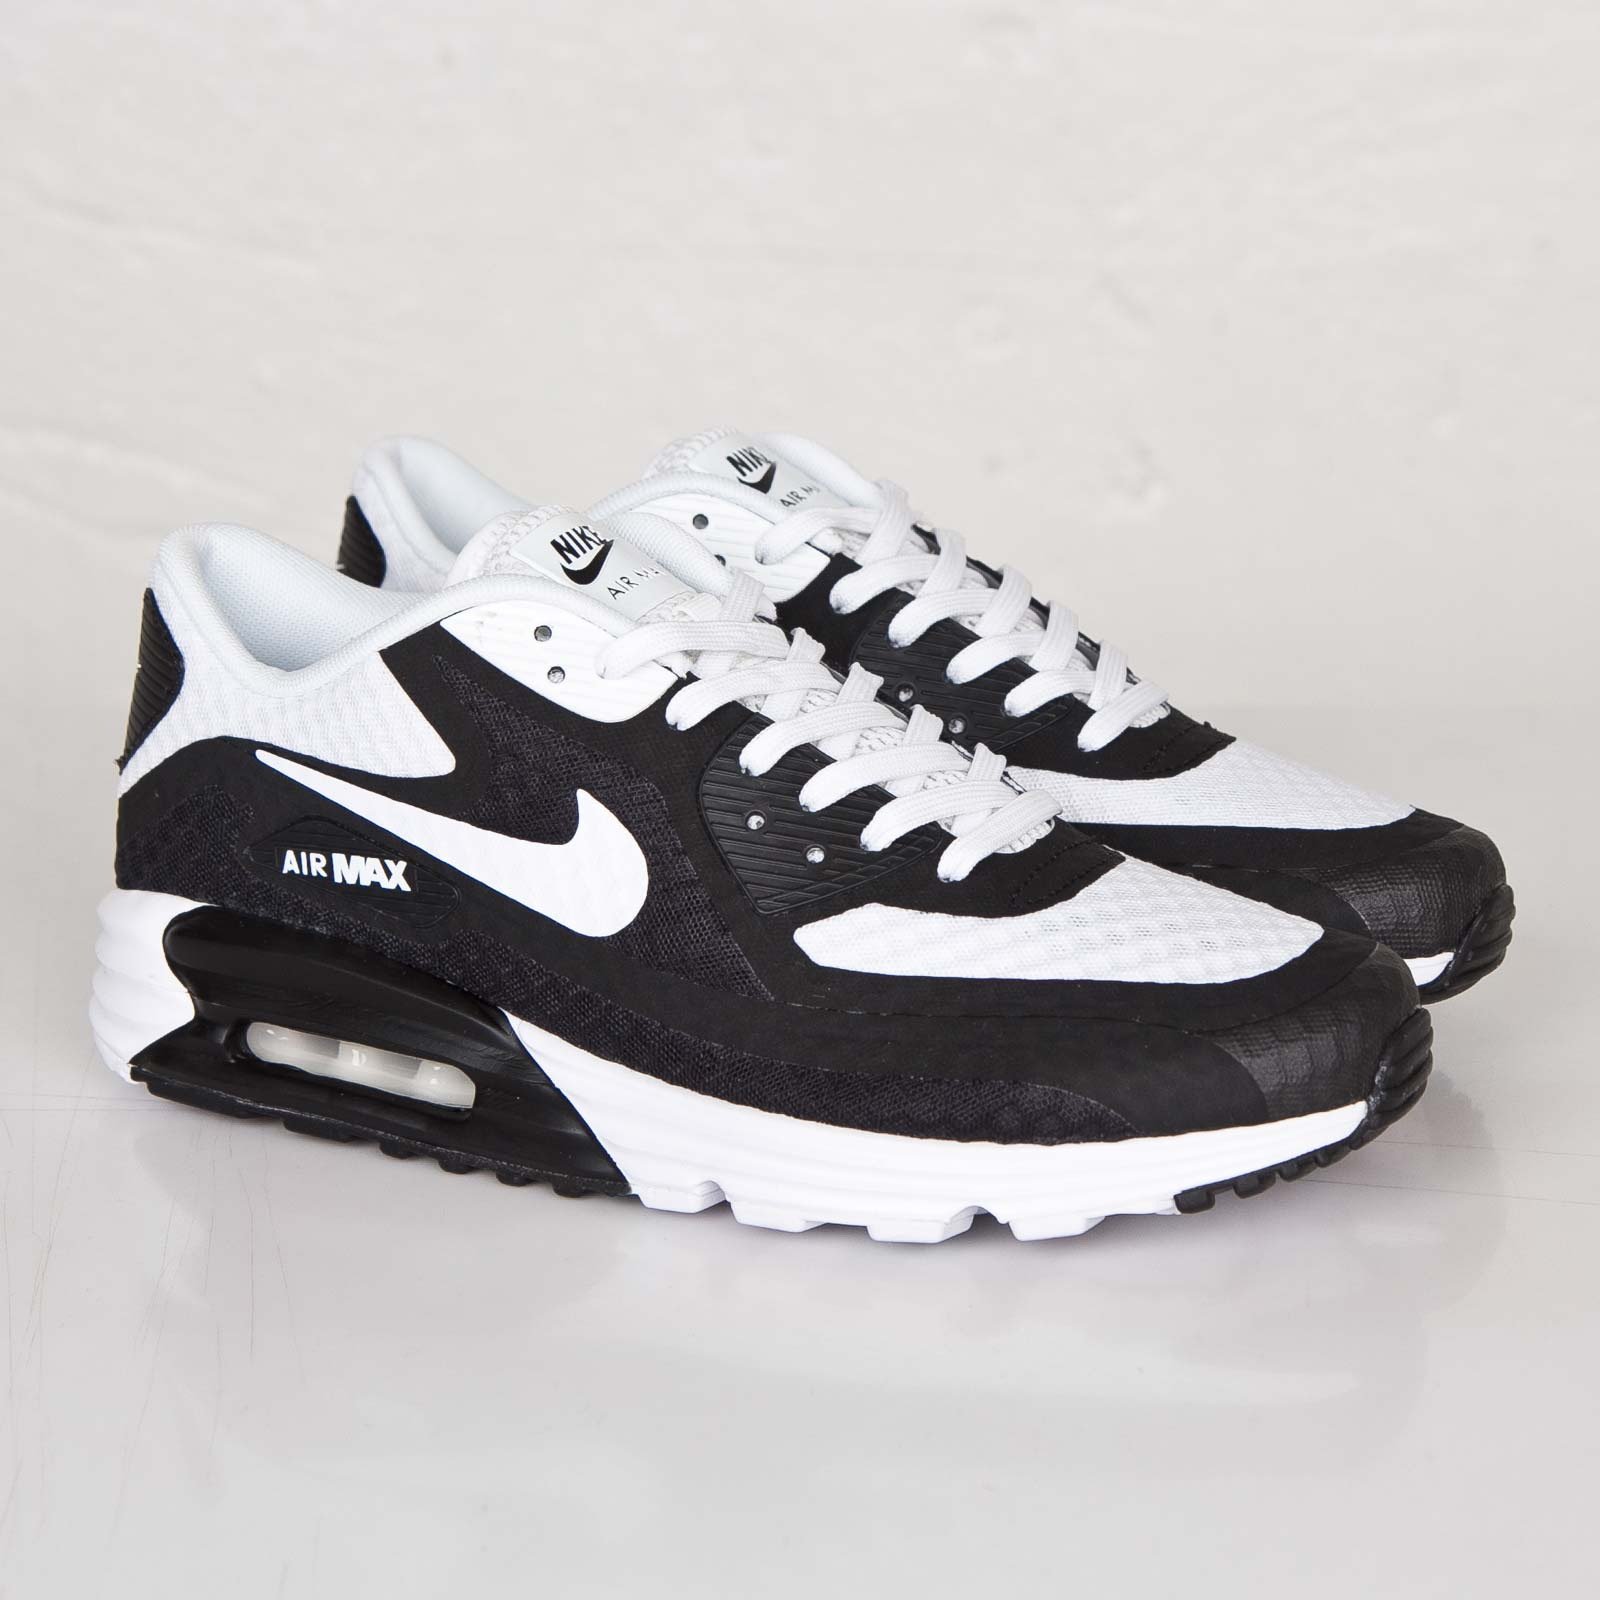 Nike Air Max Lunar90 Breeze - 724078-001 - Sneakersnstuff  13f45be25